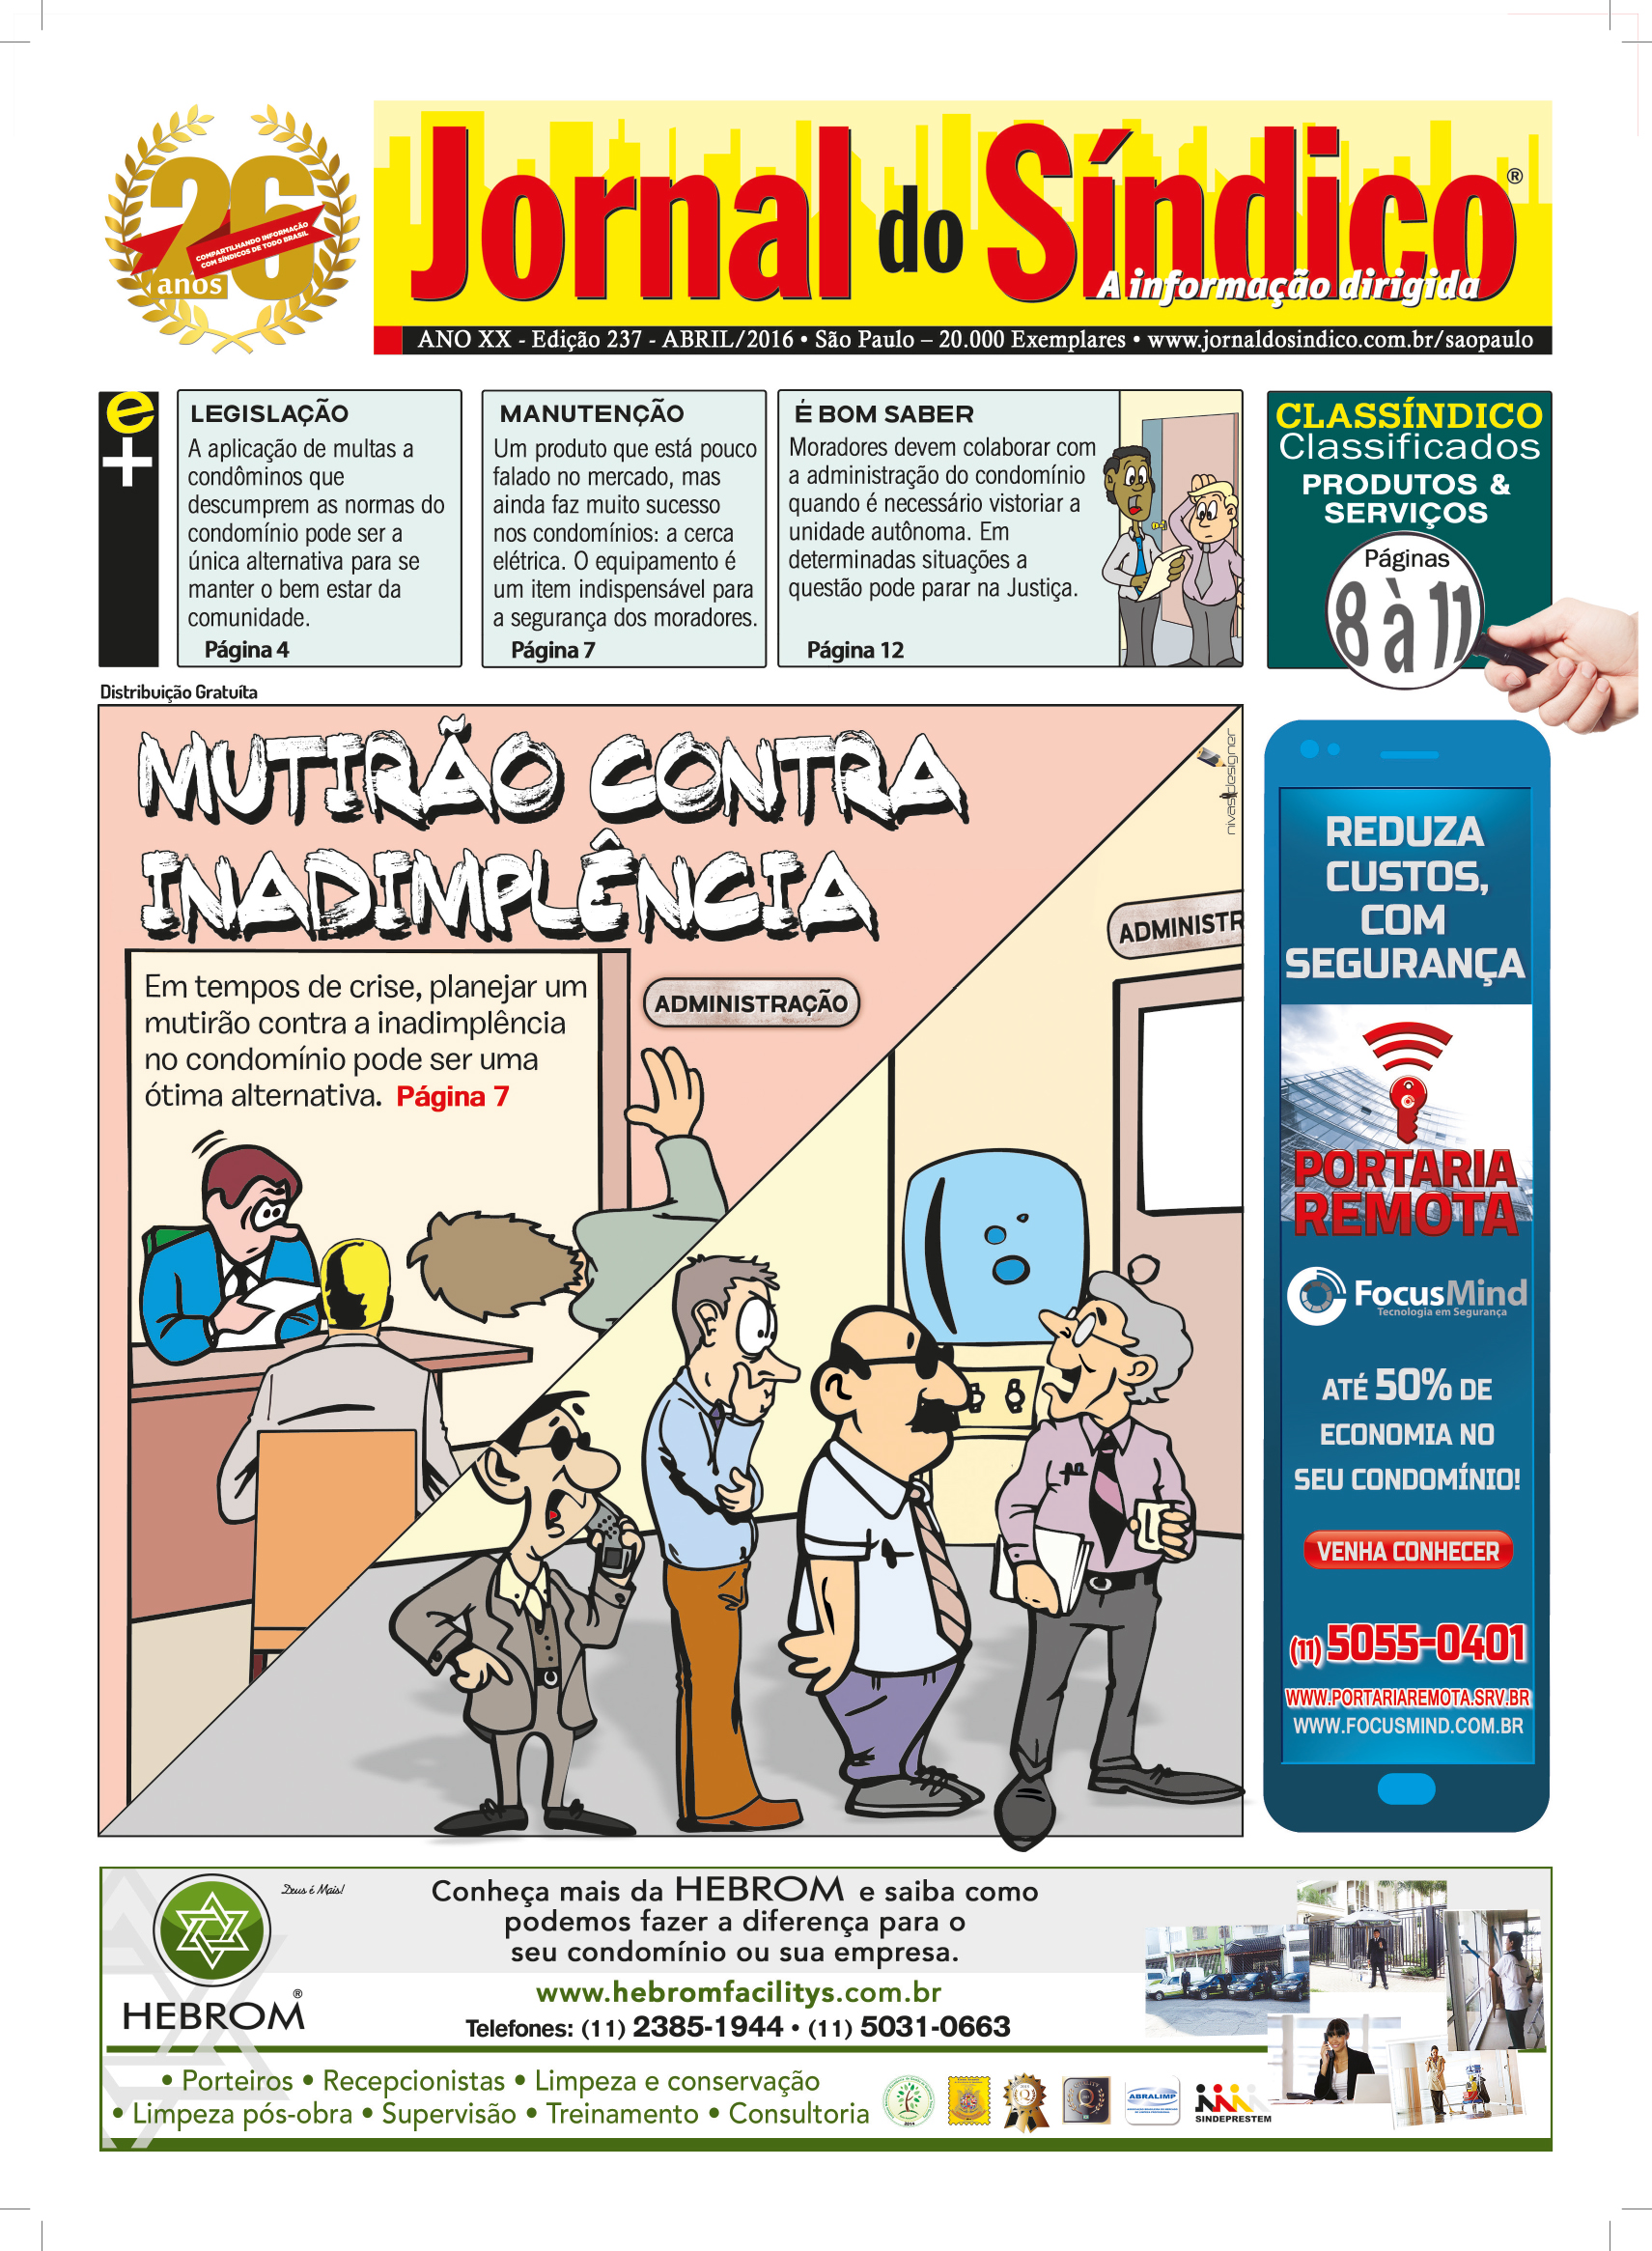 Jornal do Sindico BCKP - Edic 237.indd